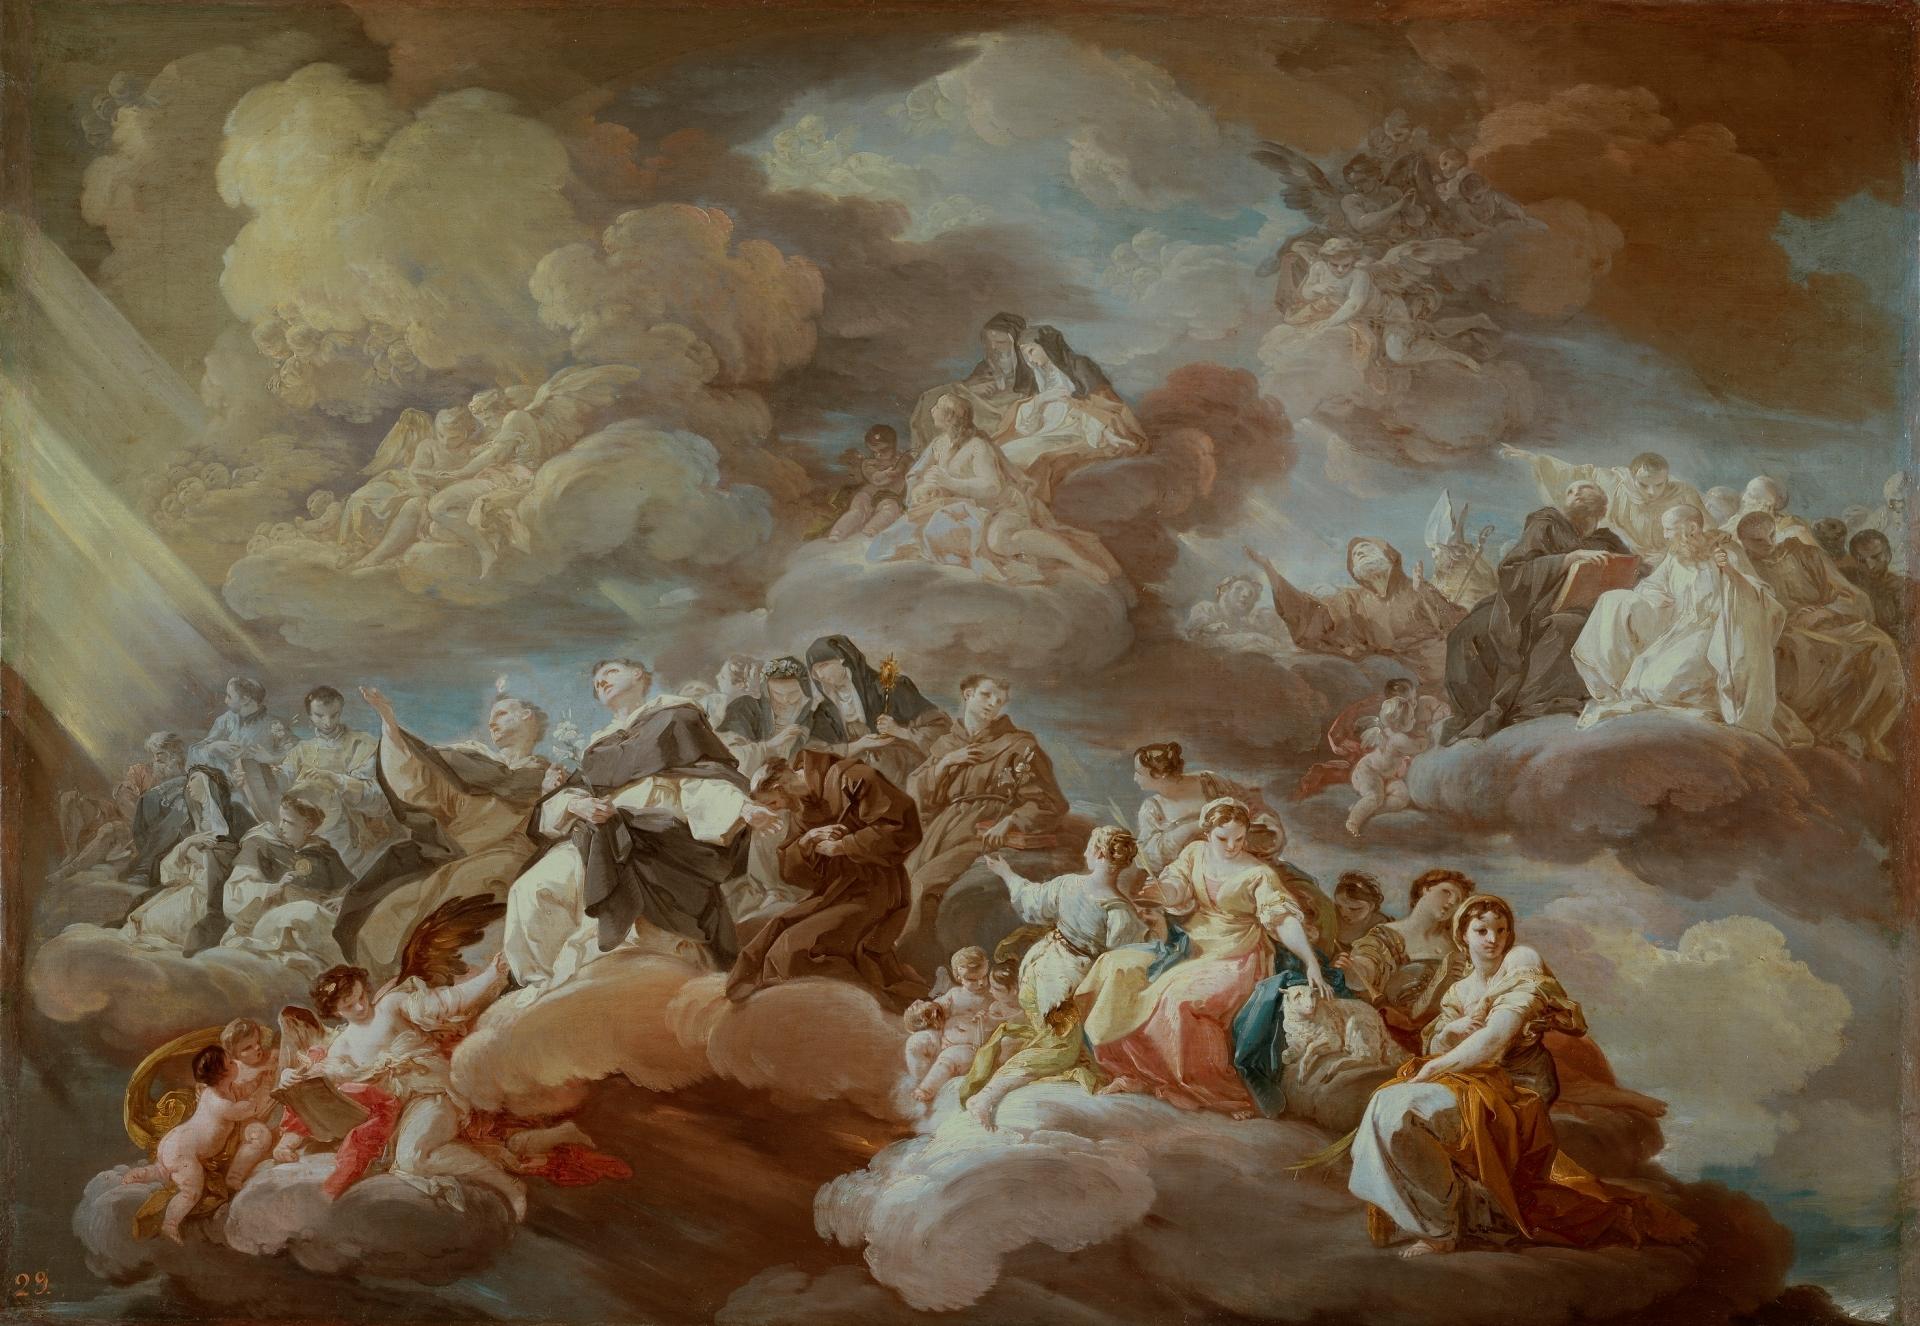 The Paradise, by Corrado Giaquinto, c. 1754-57. Museo del Prado, Madrid, Spain. Via IllustratedPrayer.com